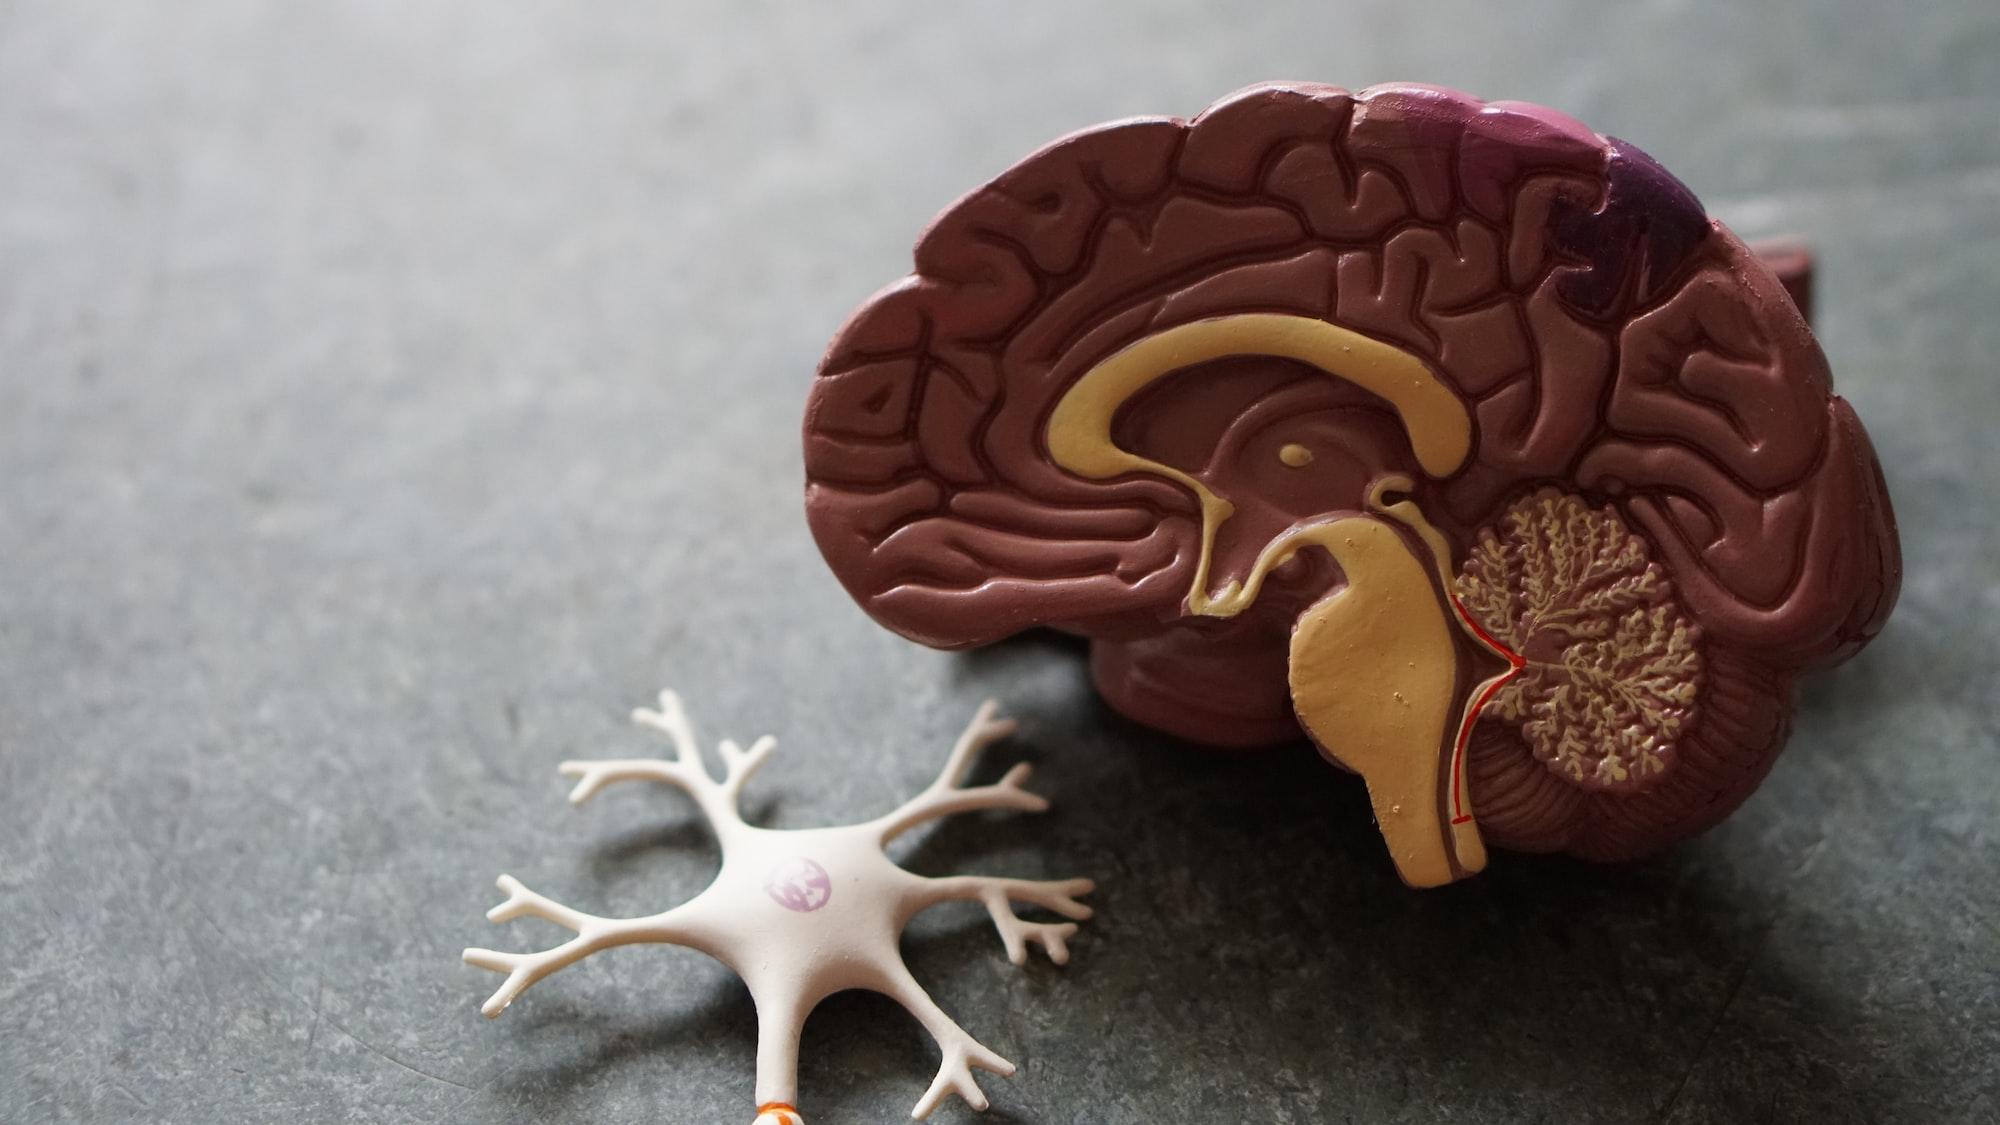 Newsletter #18 - The human brain unlocking AI